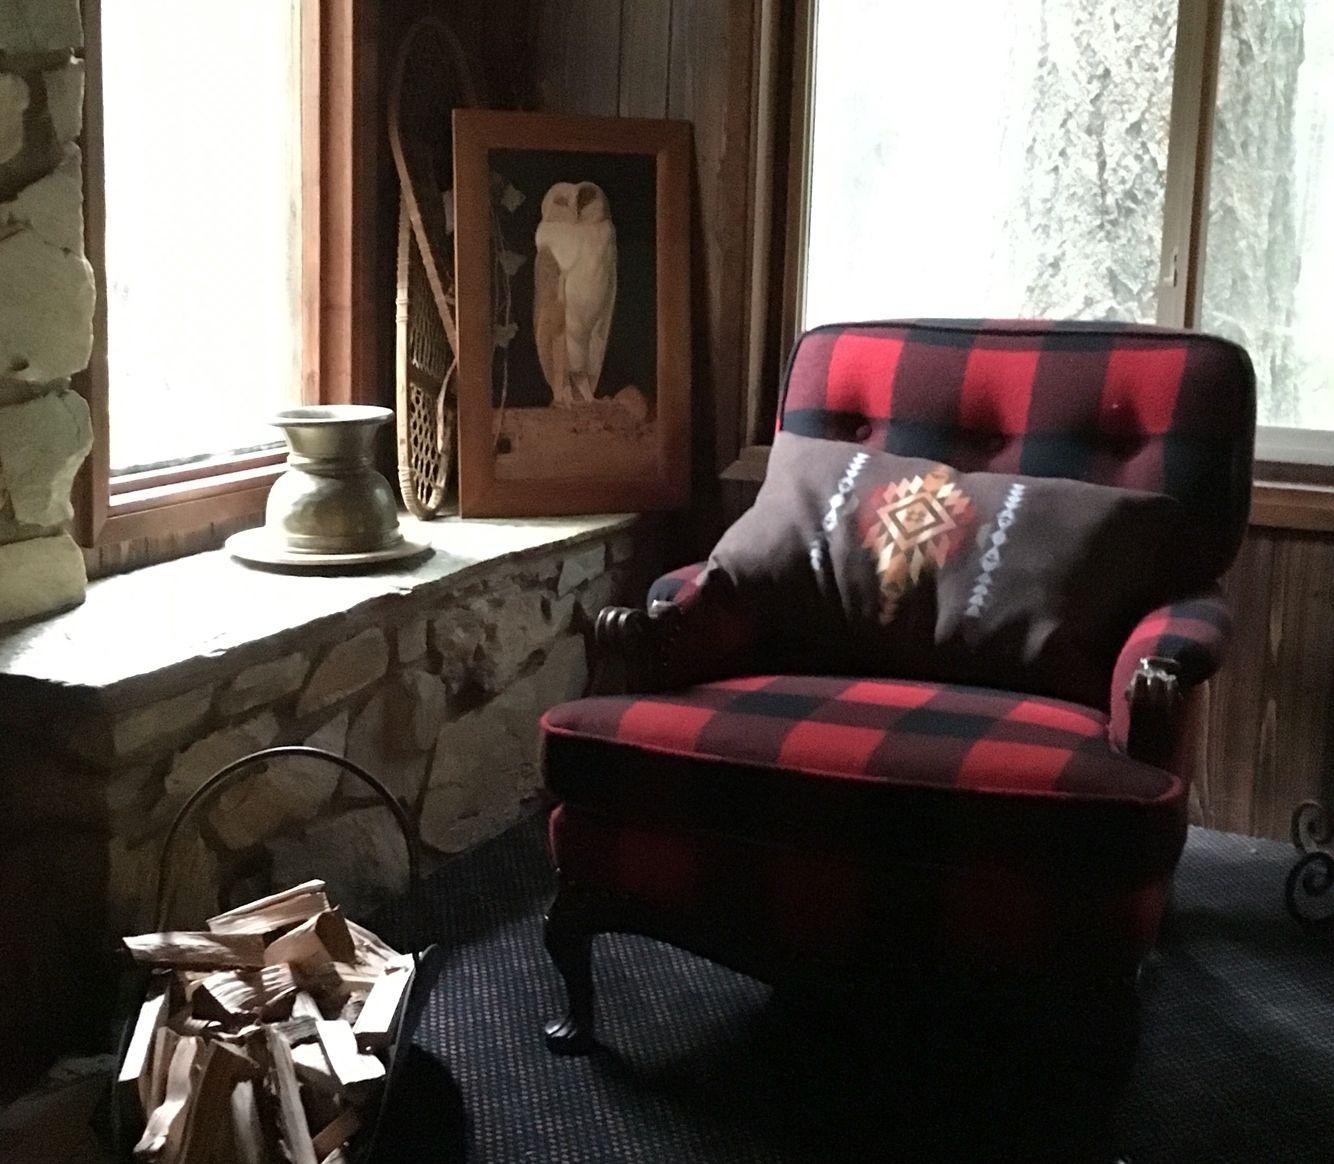 Pendleton Buffalo Plaid Chair With Pueblo Dwelling Pillow.